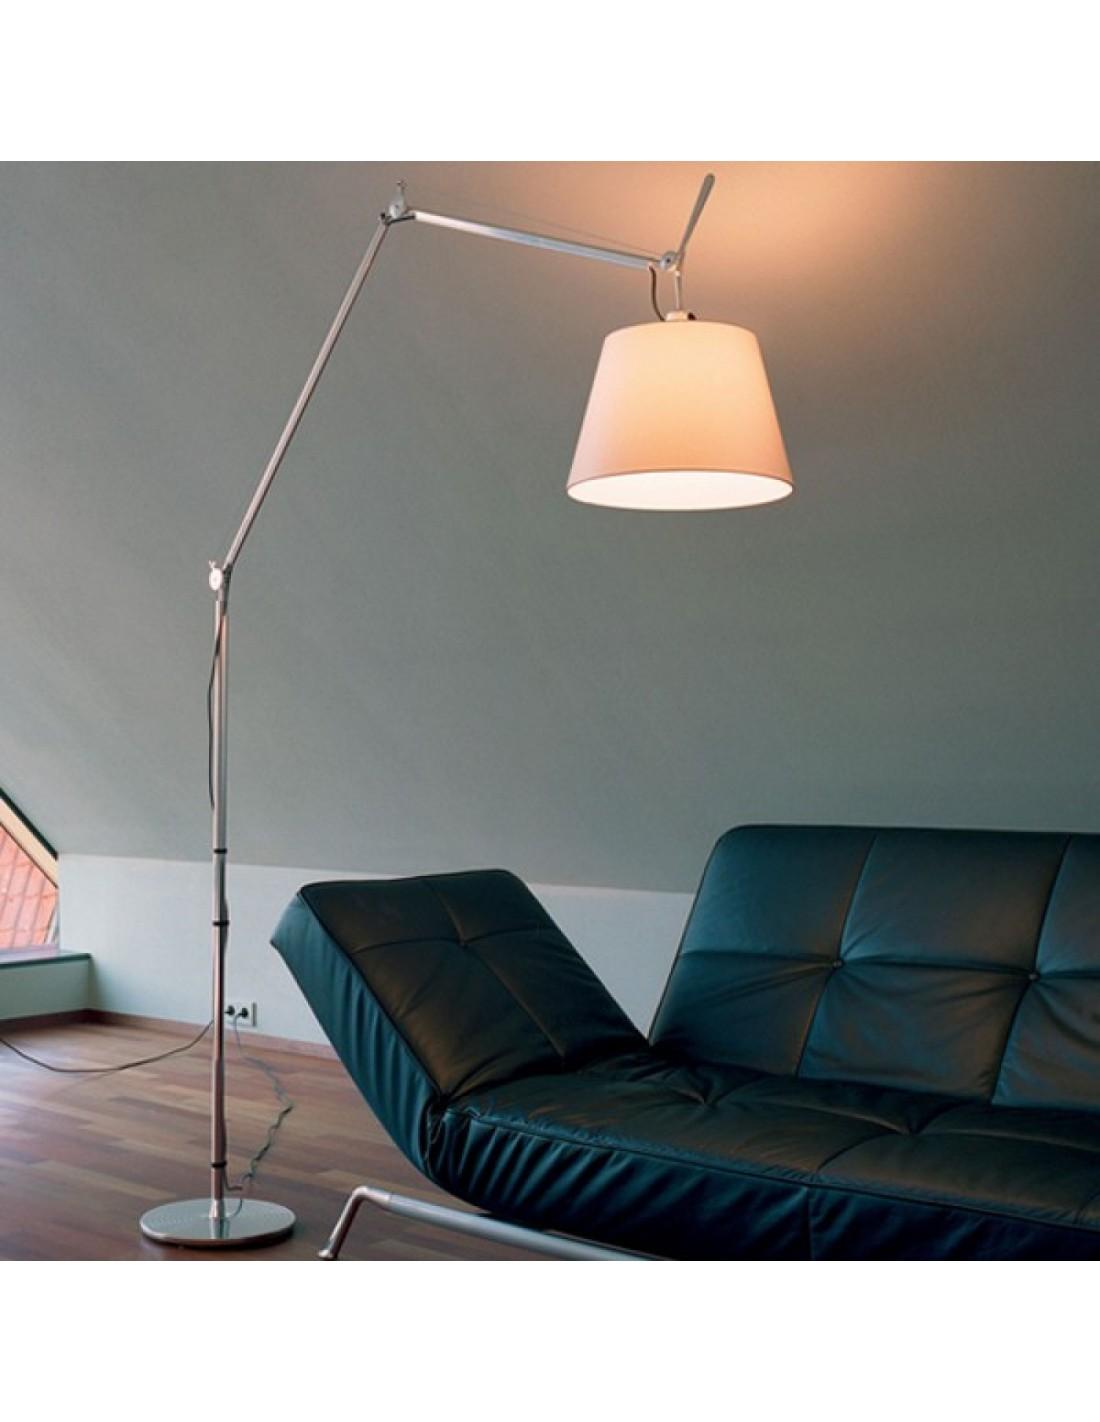 lampadaire artemide tolomeo mega terra mise en sc ne. Black Bedroom Furniture Sets. Home Design Ideas